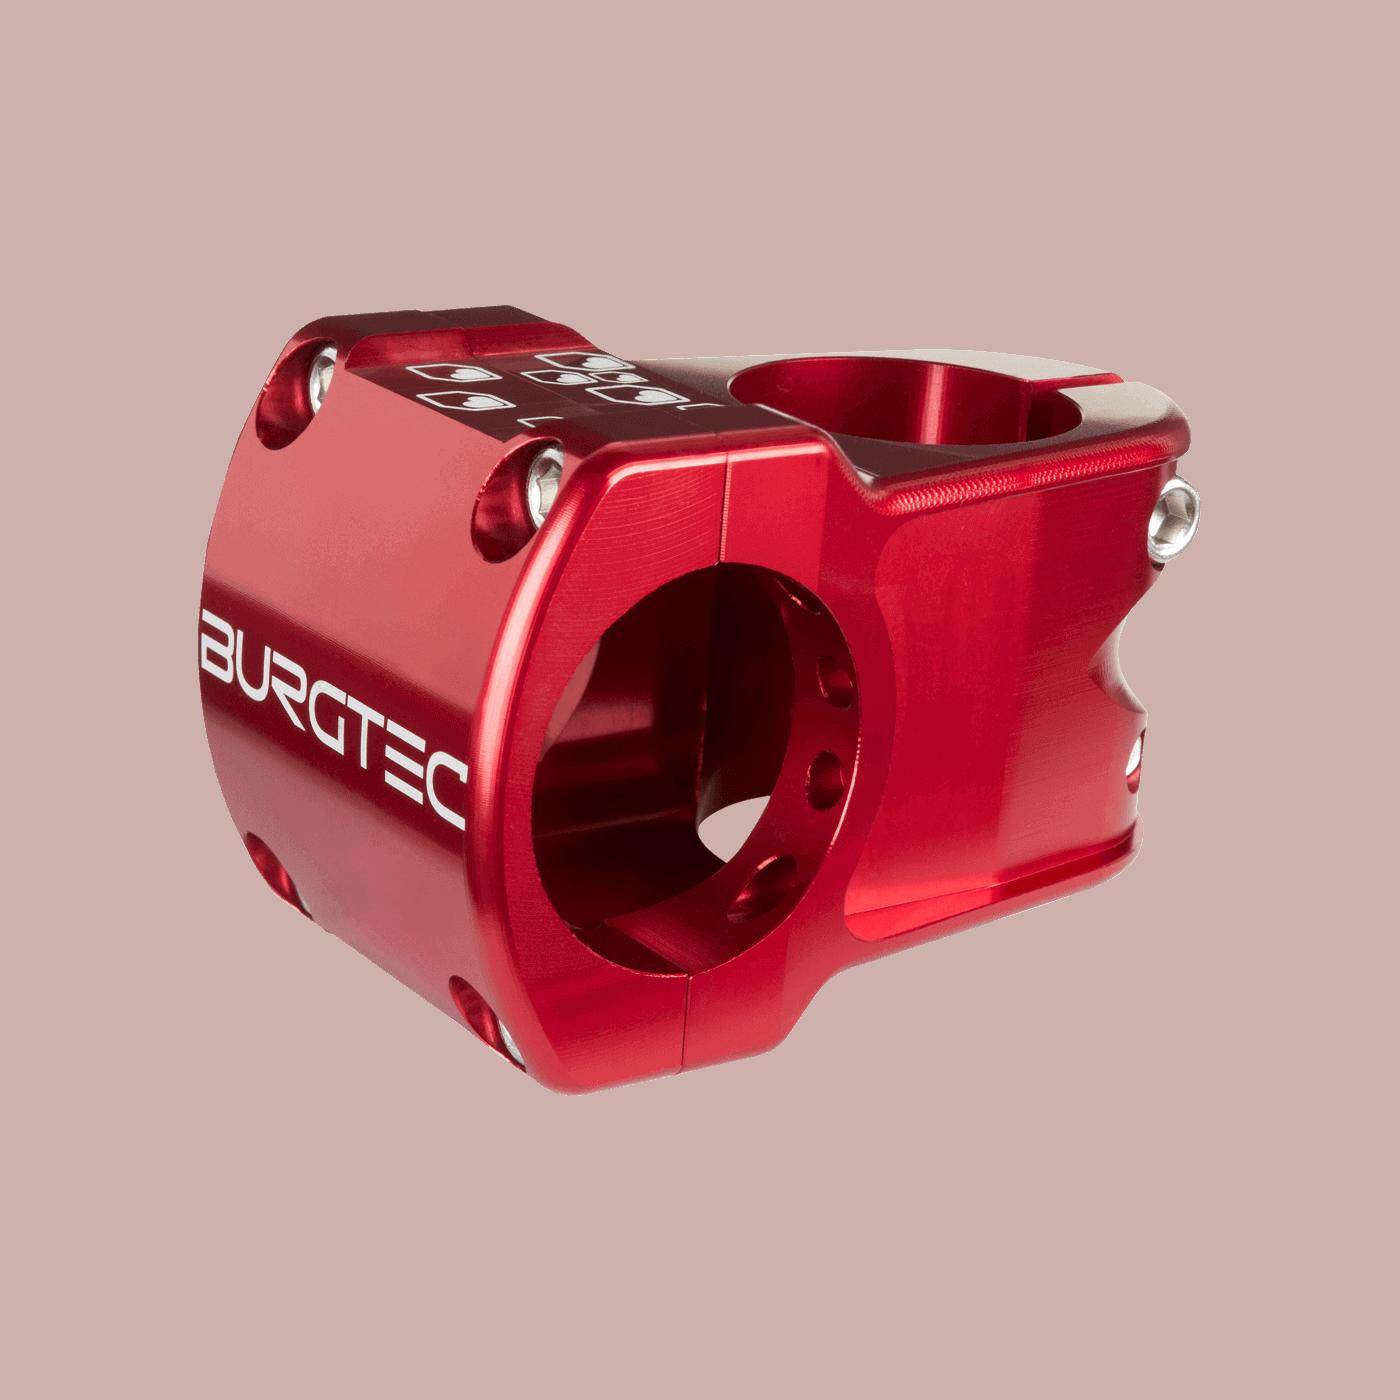 Burgtec Enduro Stem 35mm Race Red